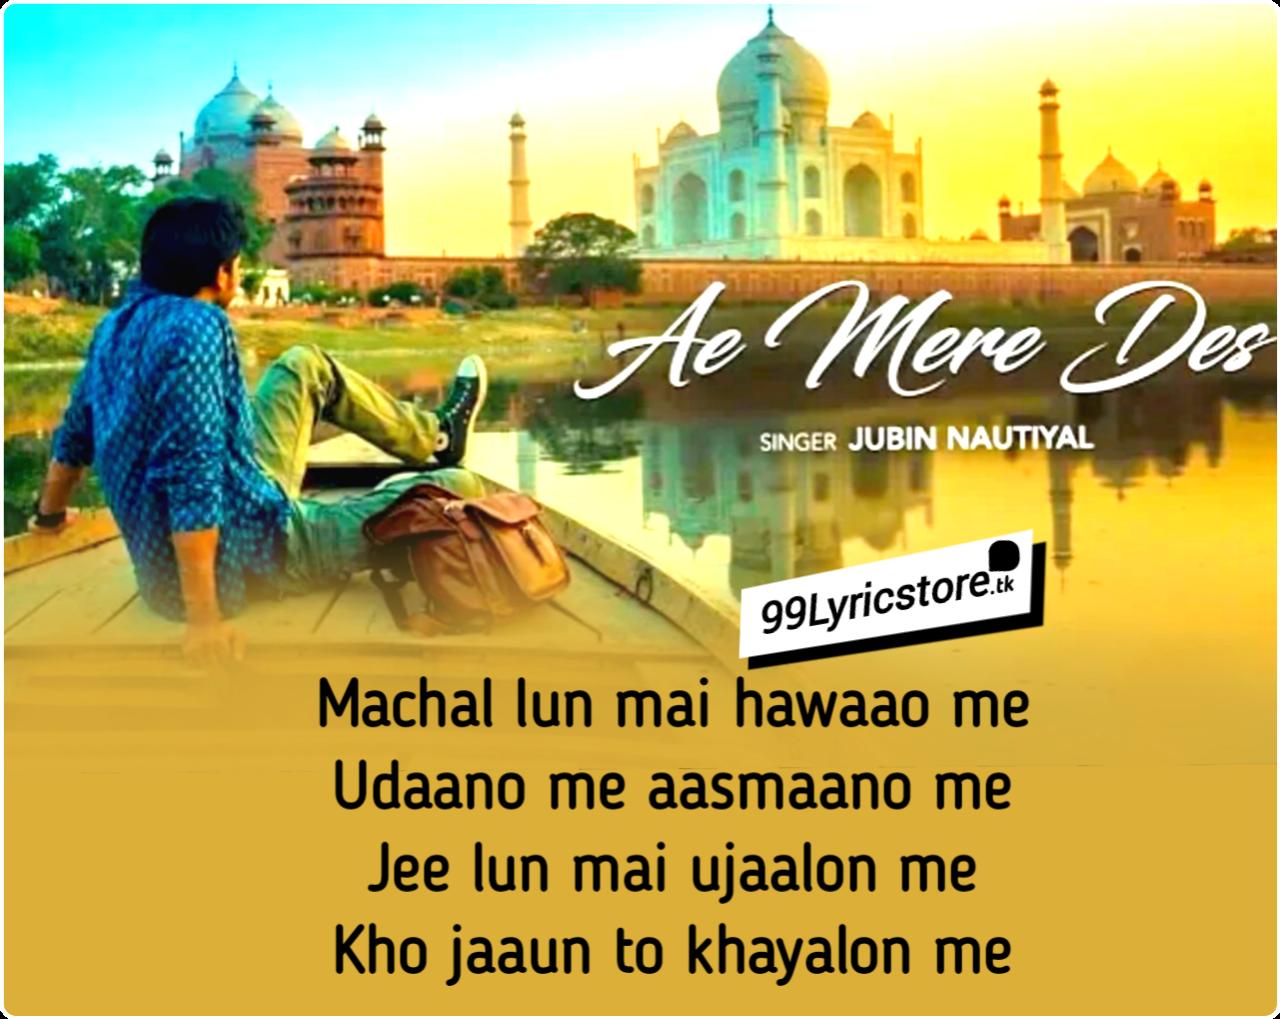 Ae mere des Lyrics , Ae mere des JUBIN Nautiyal Lyrics , JUBIN NAUTIYAL Ae Mere Des Lyrics , Lalit Prabhakar Song Are mere des Lyrics  ,JUBIN NAUTIYAL Song Lyrics , Ae mere des T-Series Lyrics , latest Hindi song lyrics  2018